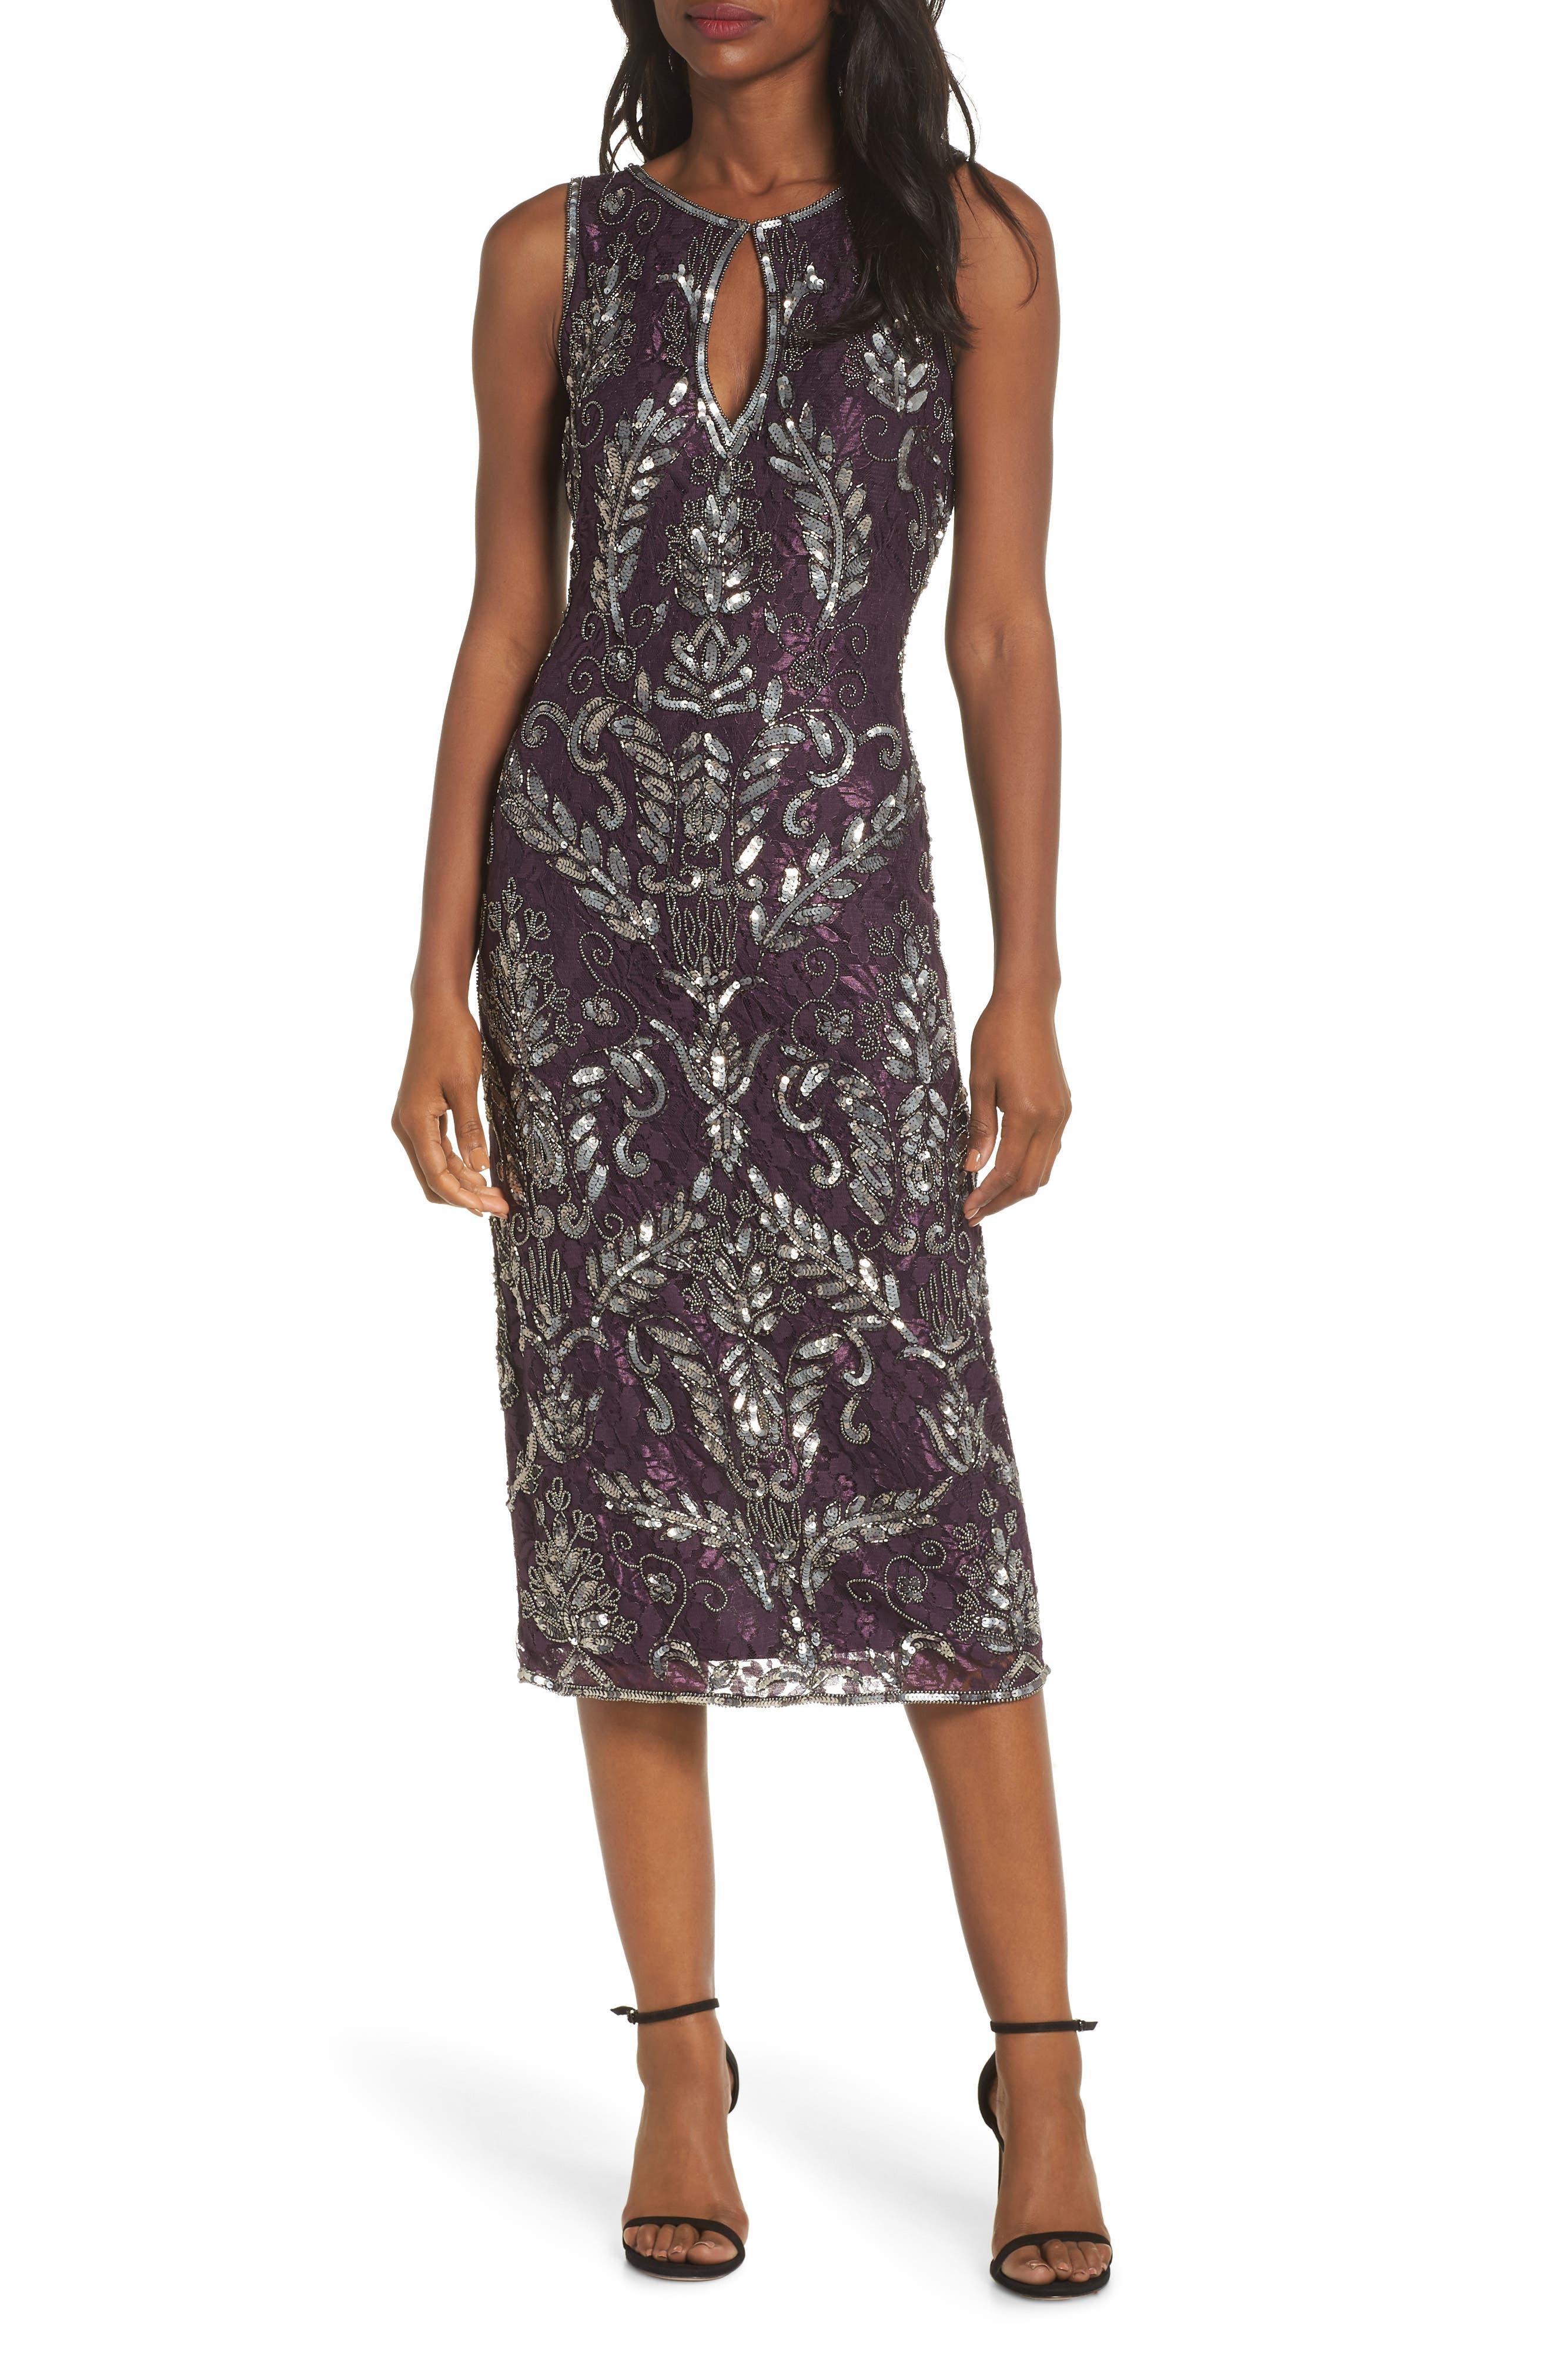 PISARRO NIGHTS Sequin Lace Sheath Dress, Main, color, WINE